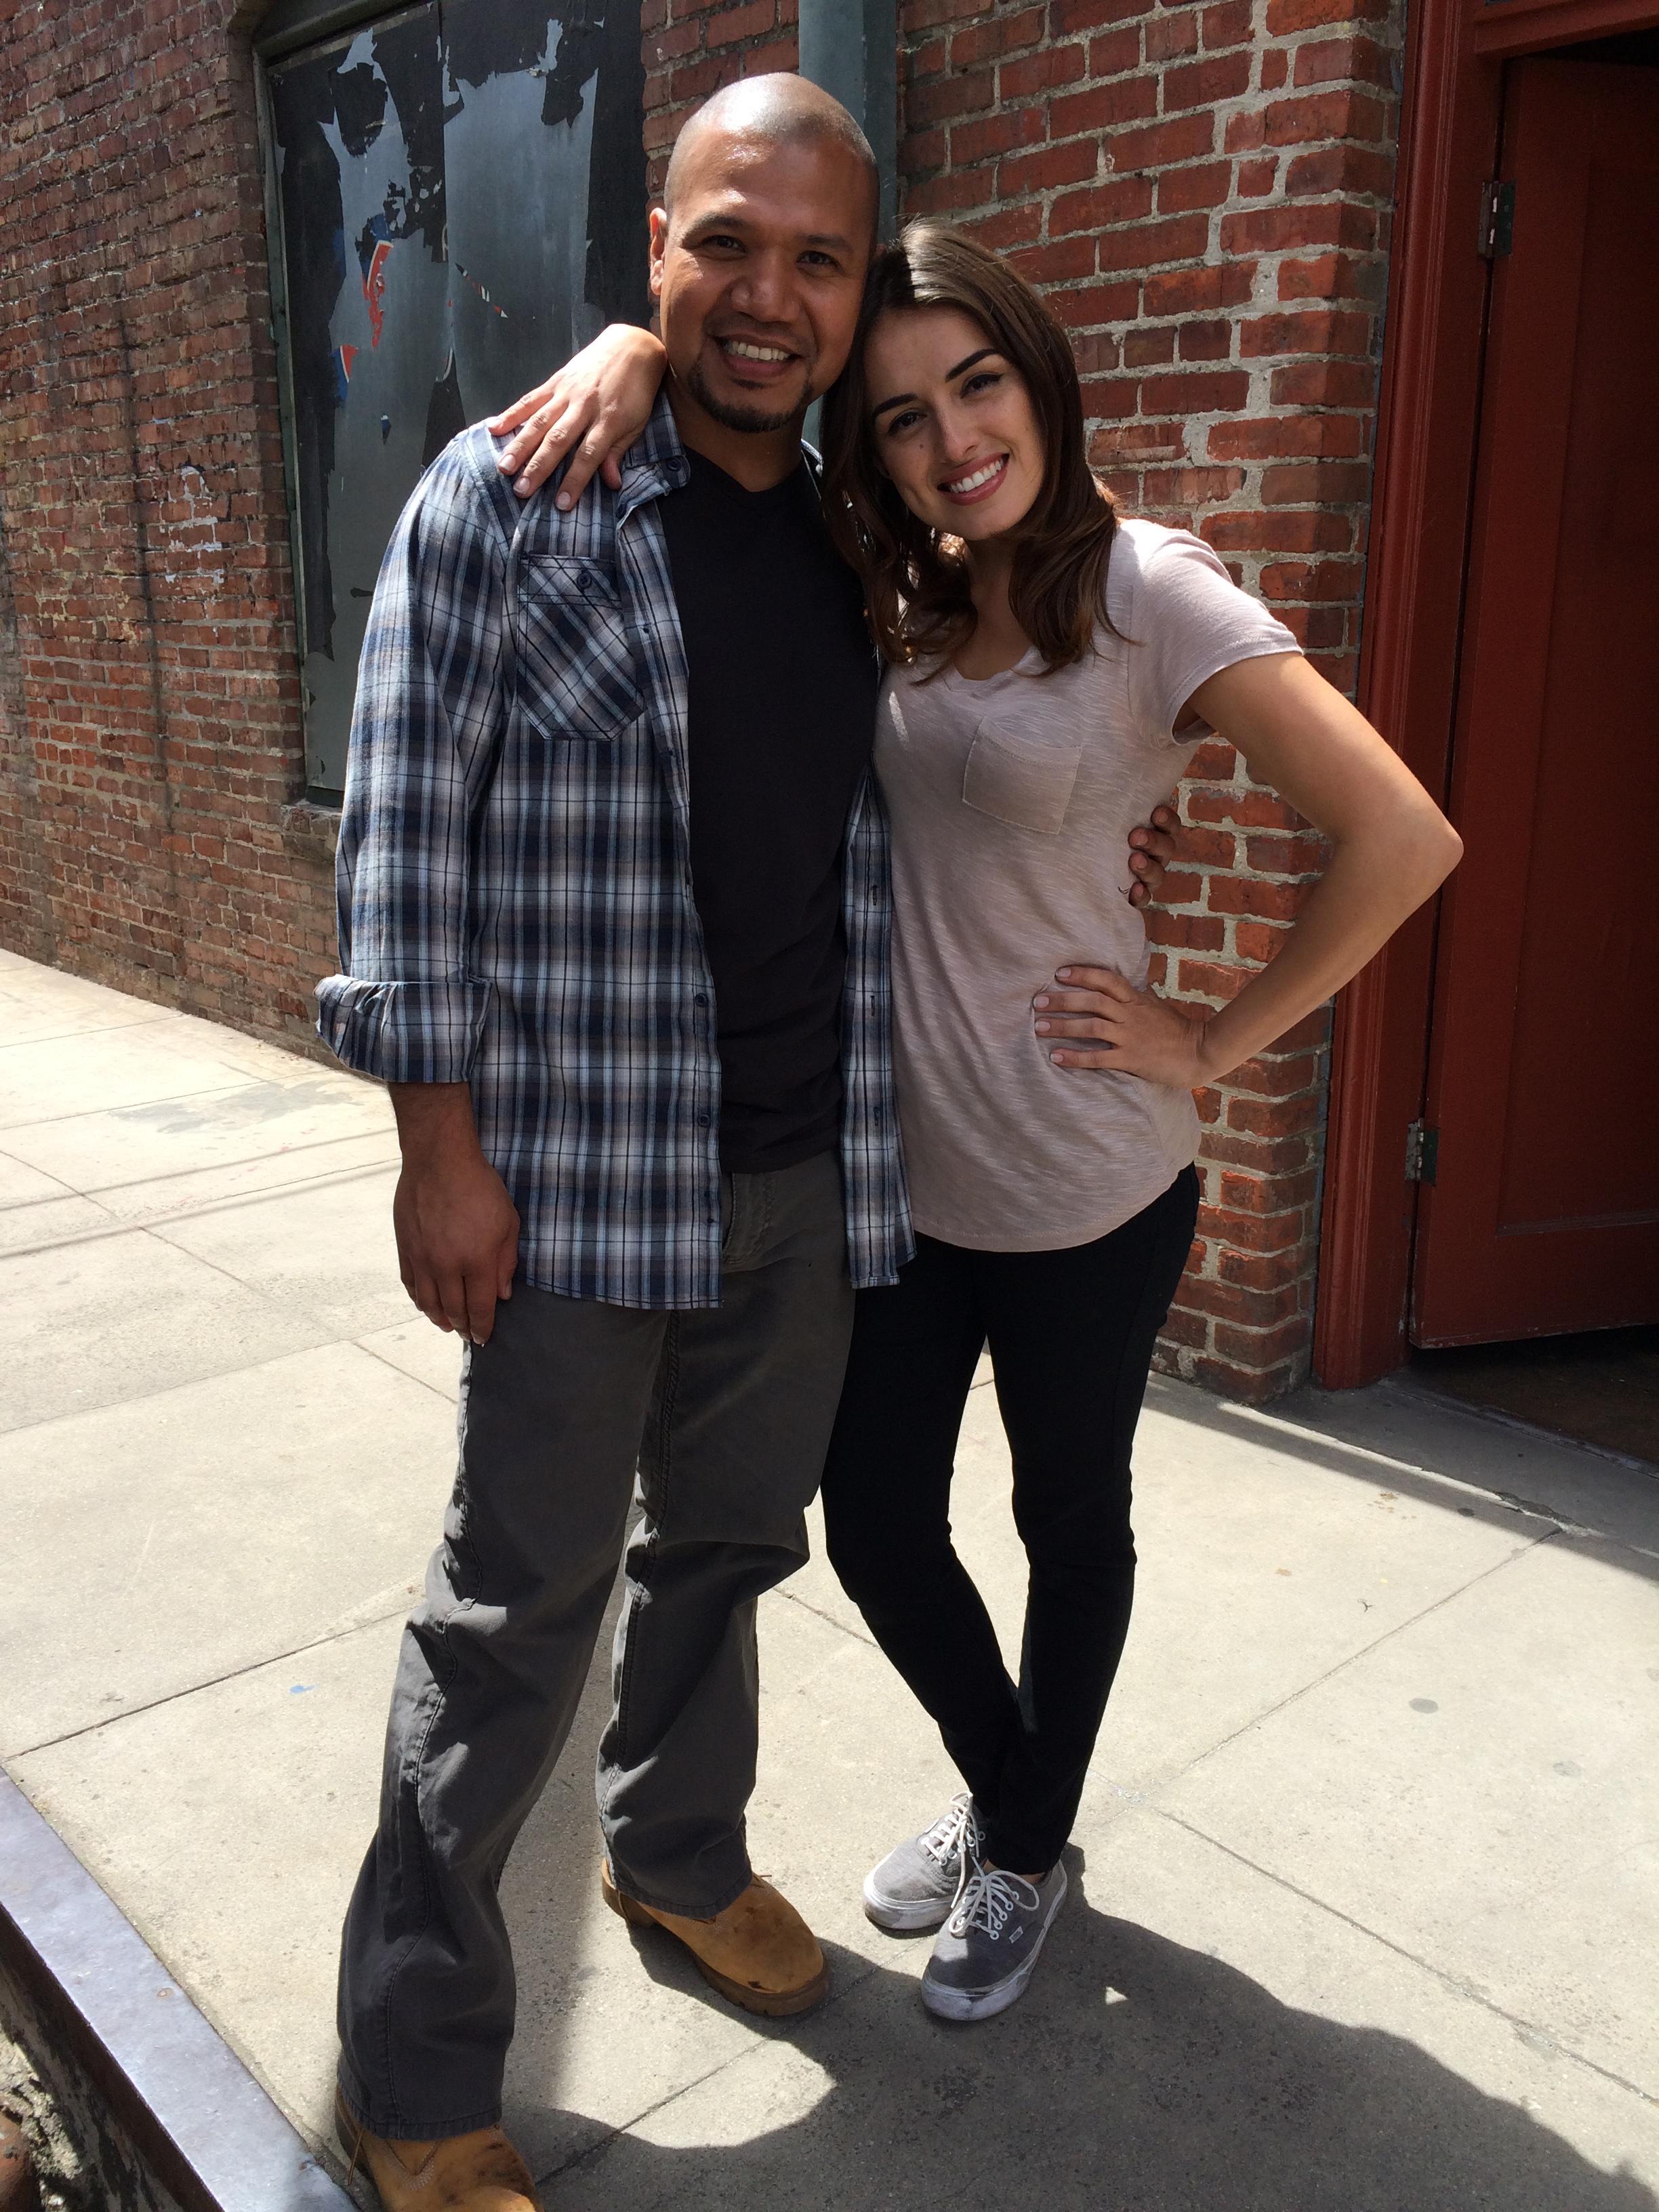 Tony Sancho and Vannessa Vasquez in East Los High (2013)